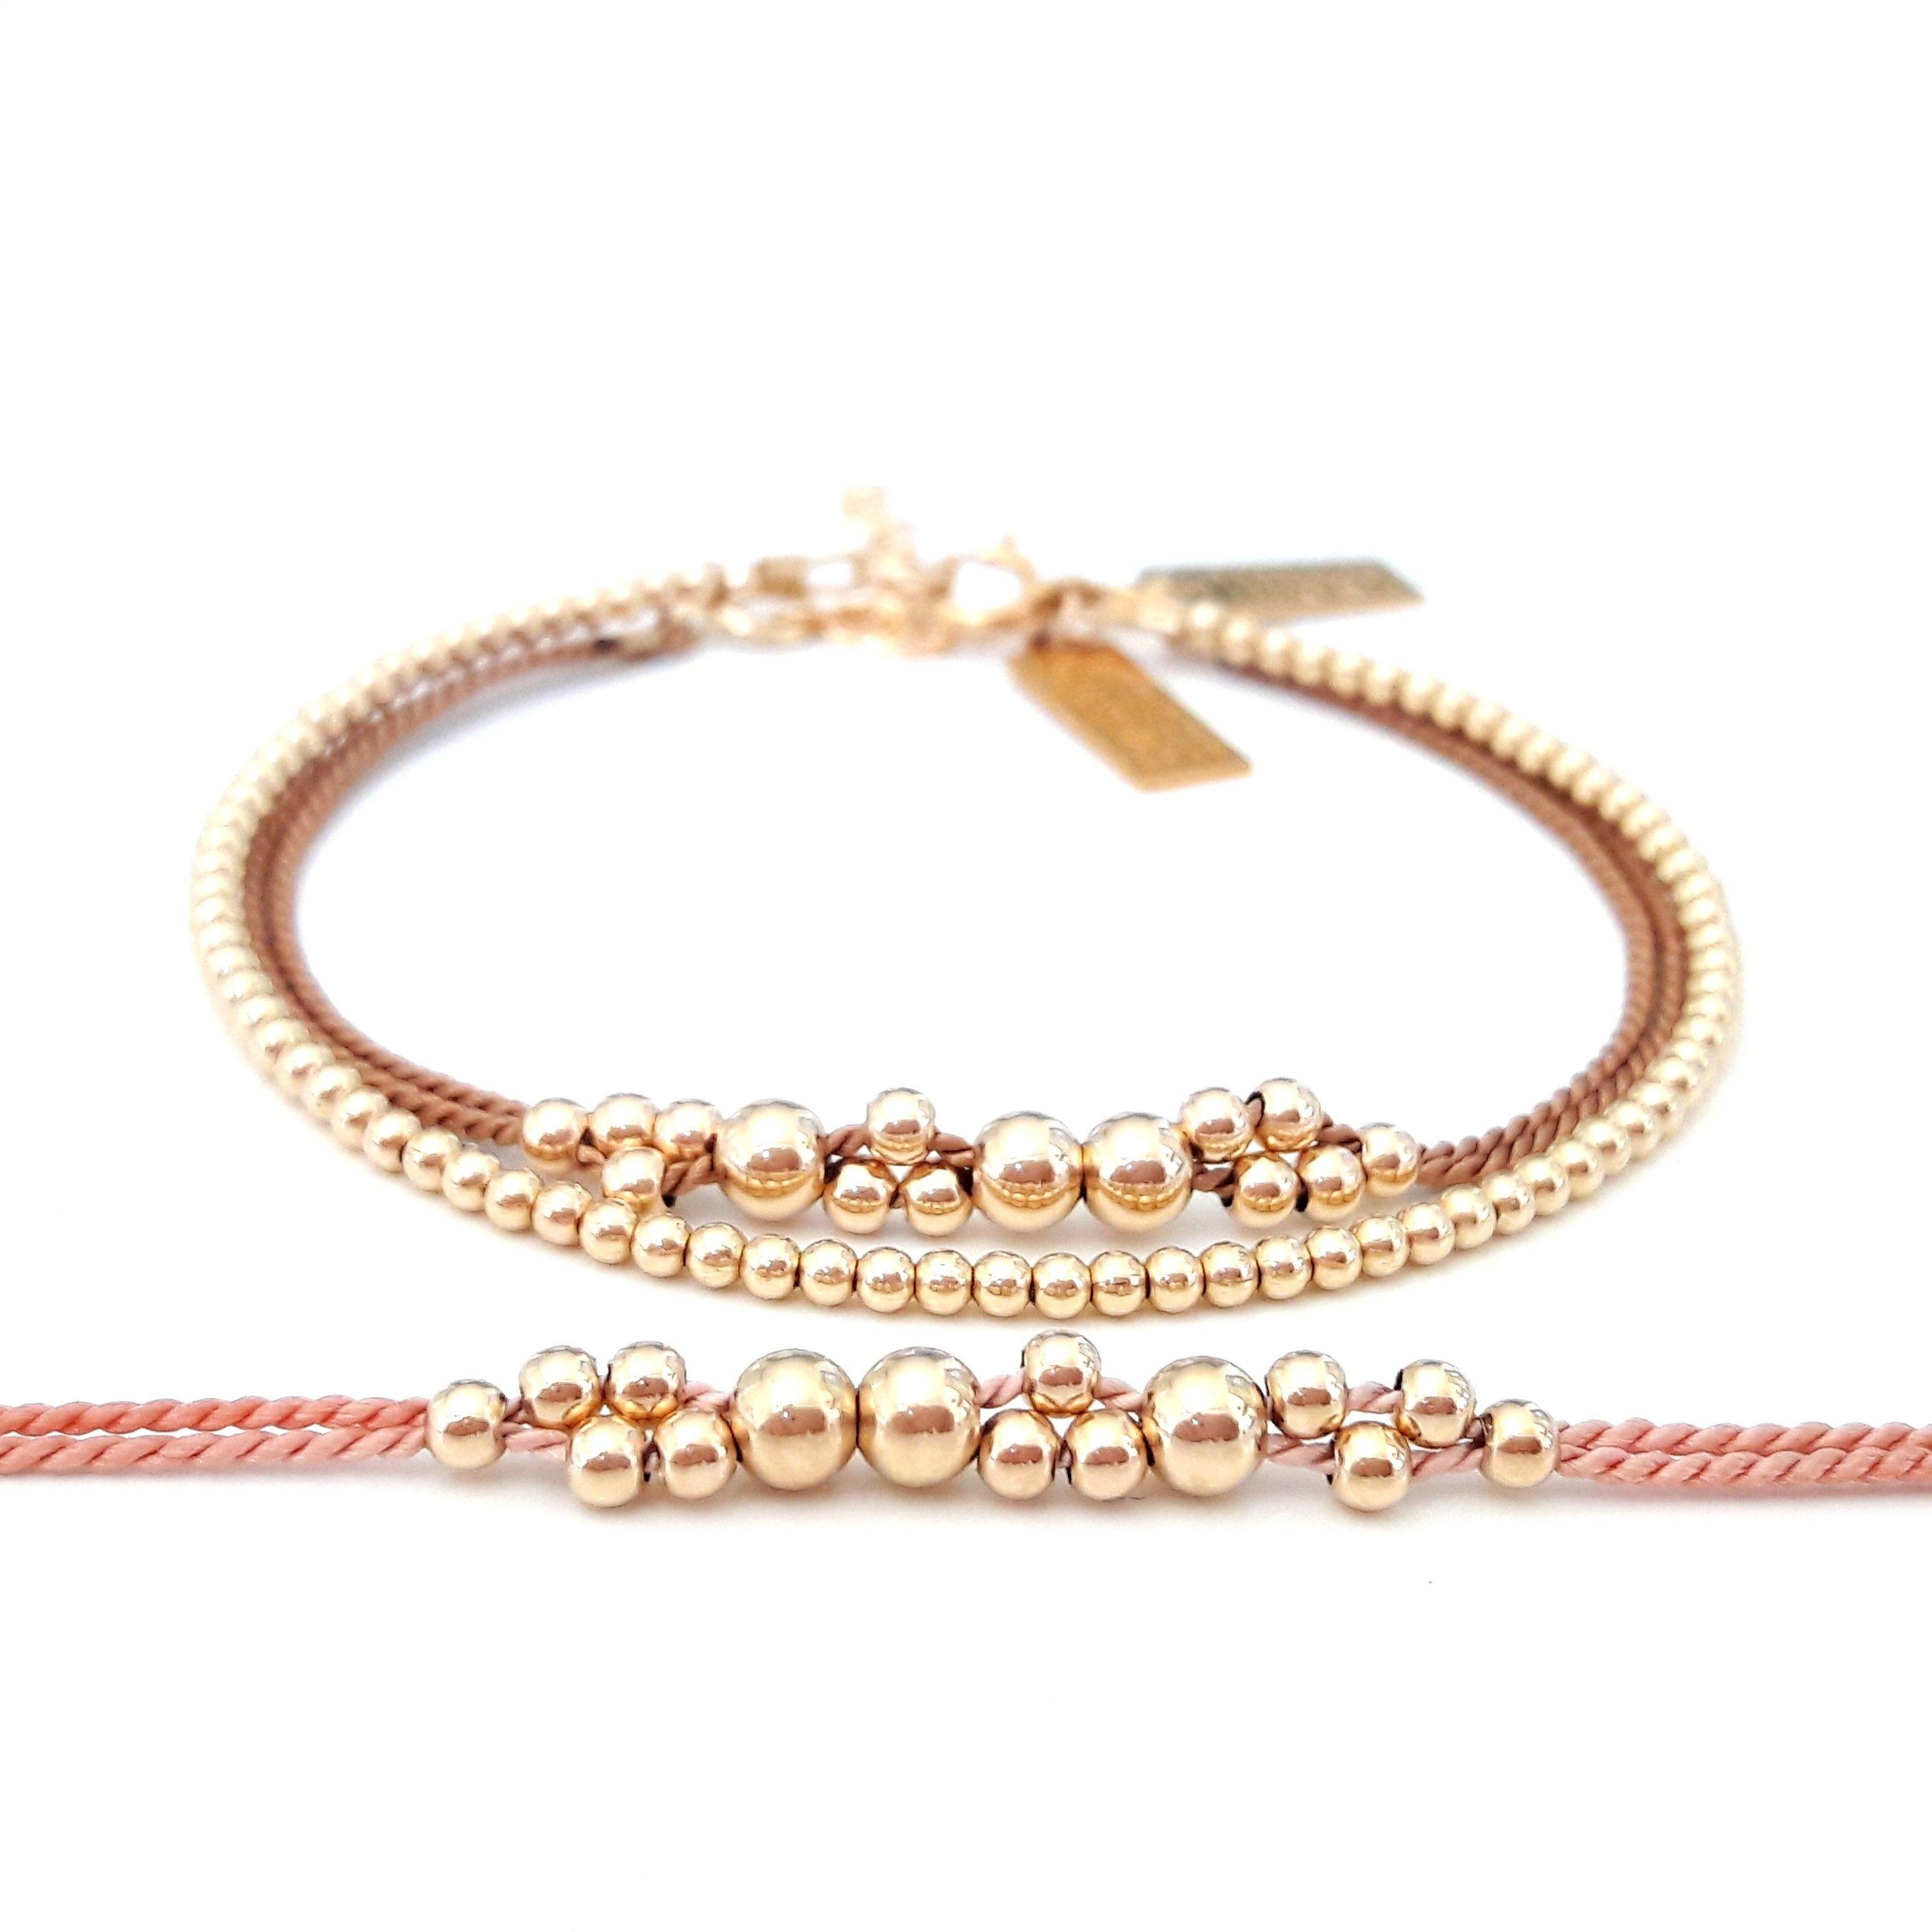 Gold seed bead bracelets perfect style for elegant girls handmade